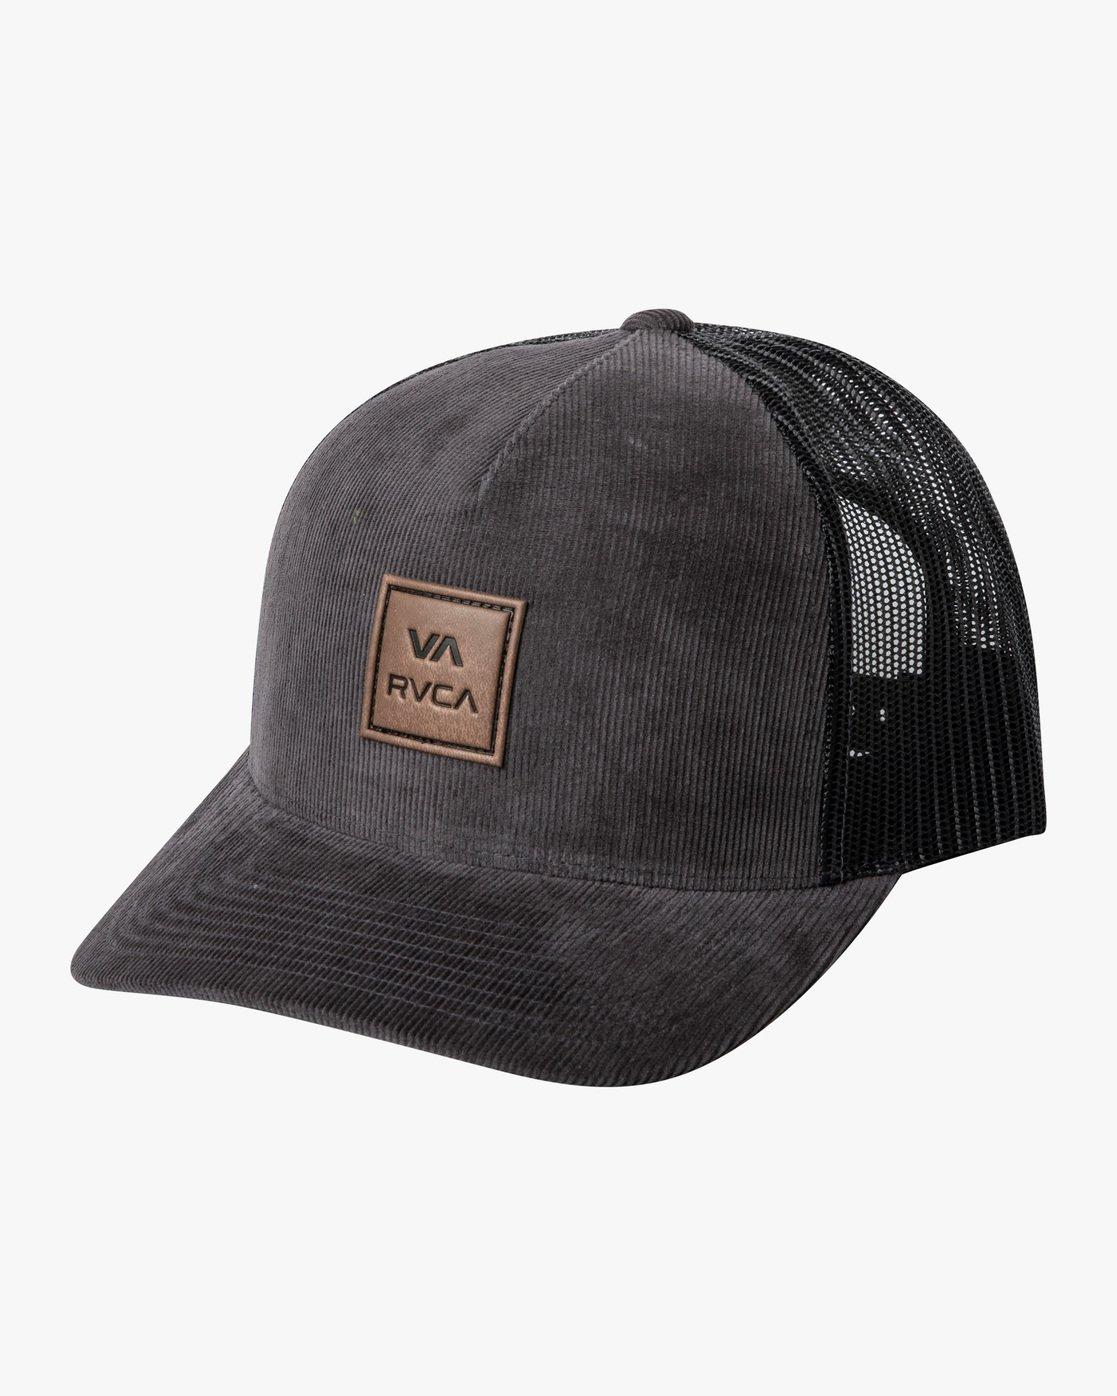 0 VA ATW CURVED BRIM TRUCKER HAT Grey MAHWPRVA RVCA